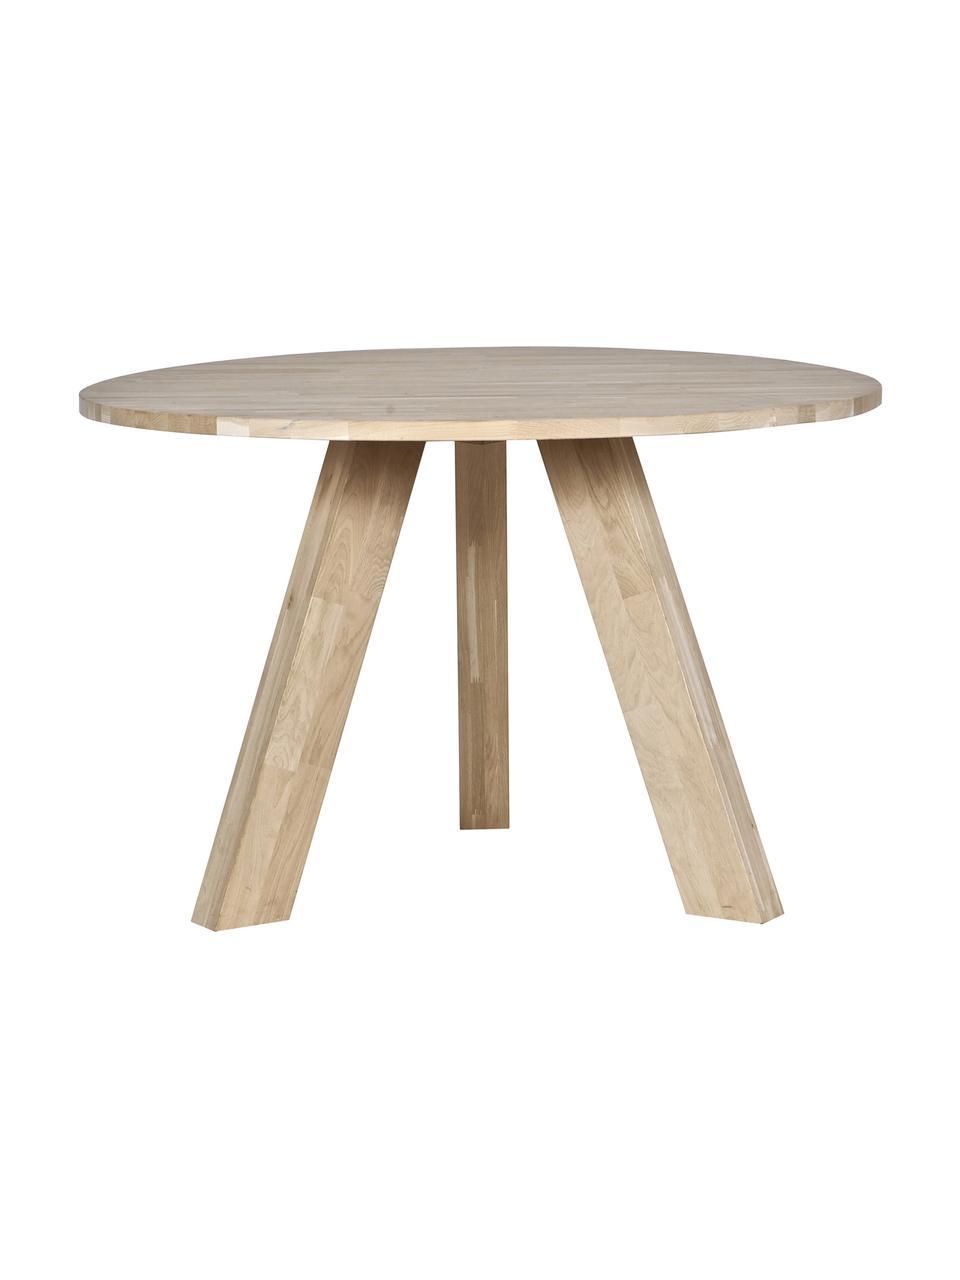 Runder Esstisch Rhonda aus Massivholz, Eichenholz, Eichenholz, Ø 129 x H 75 cm